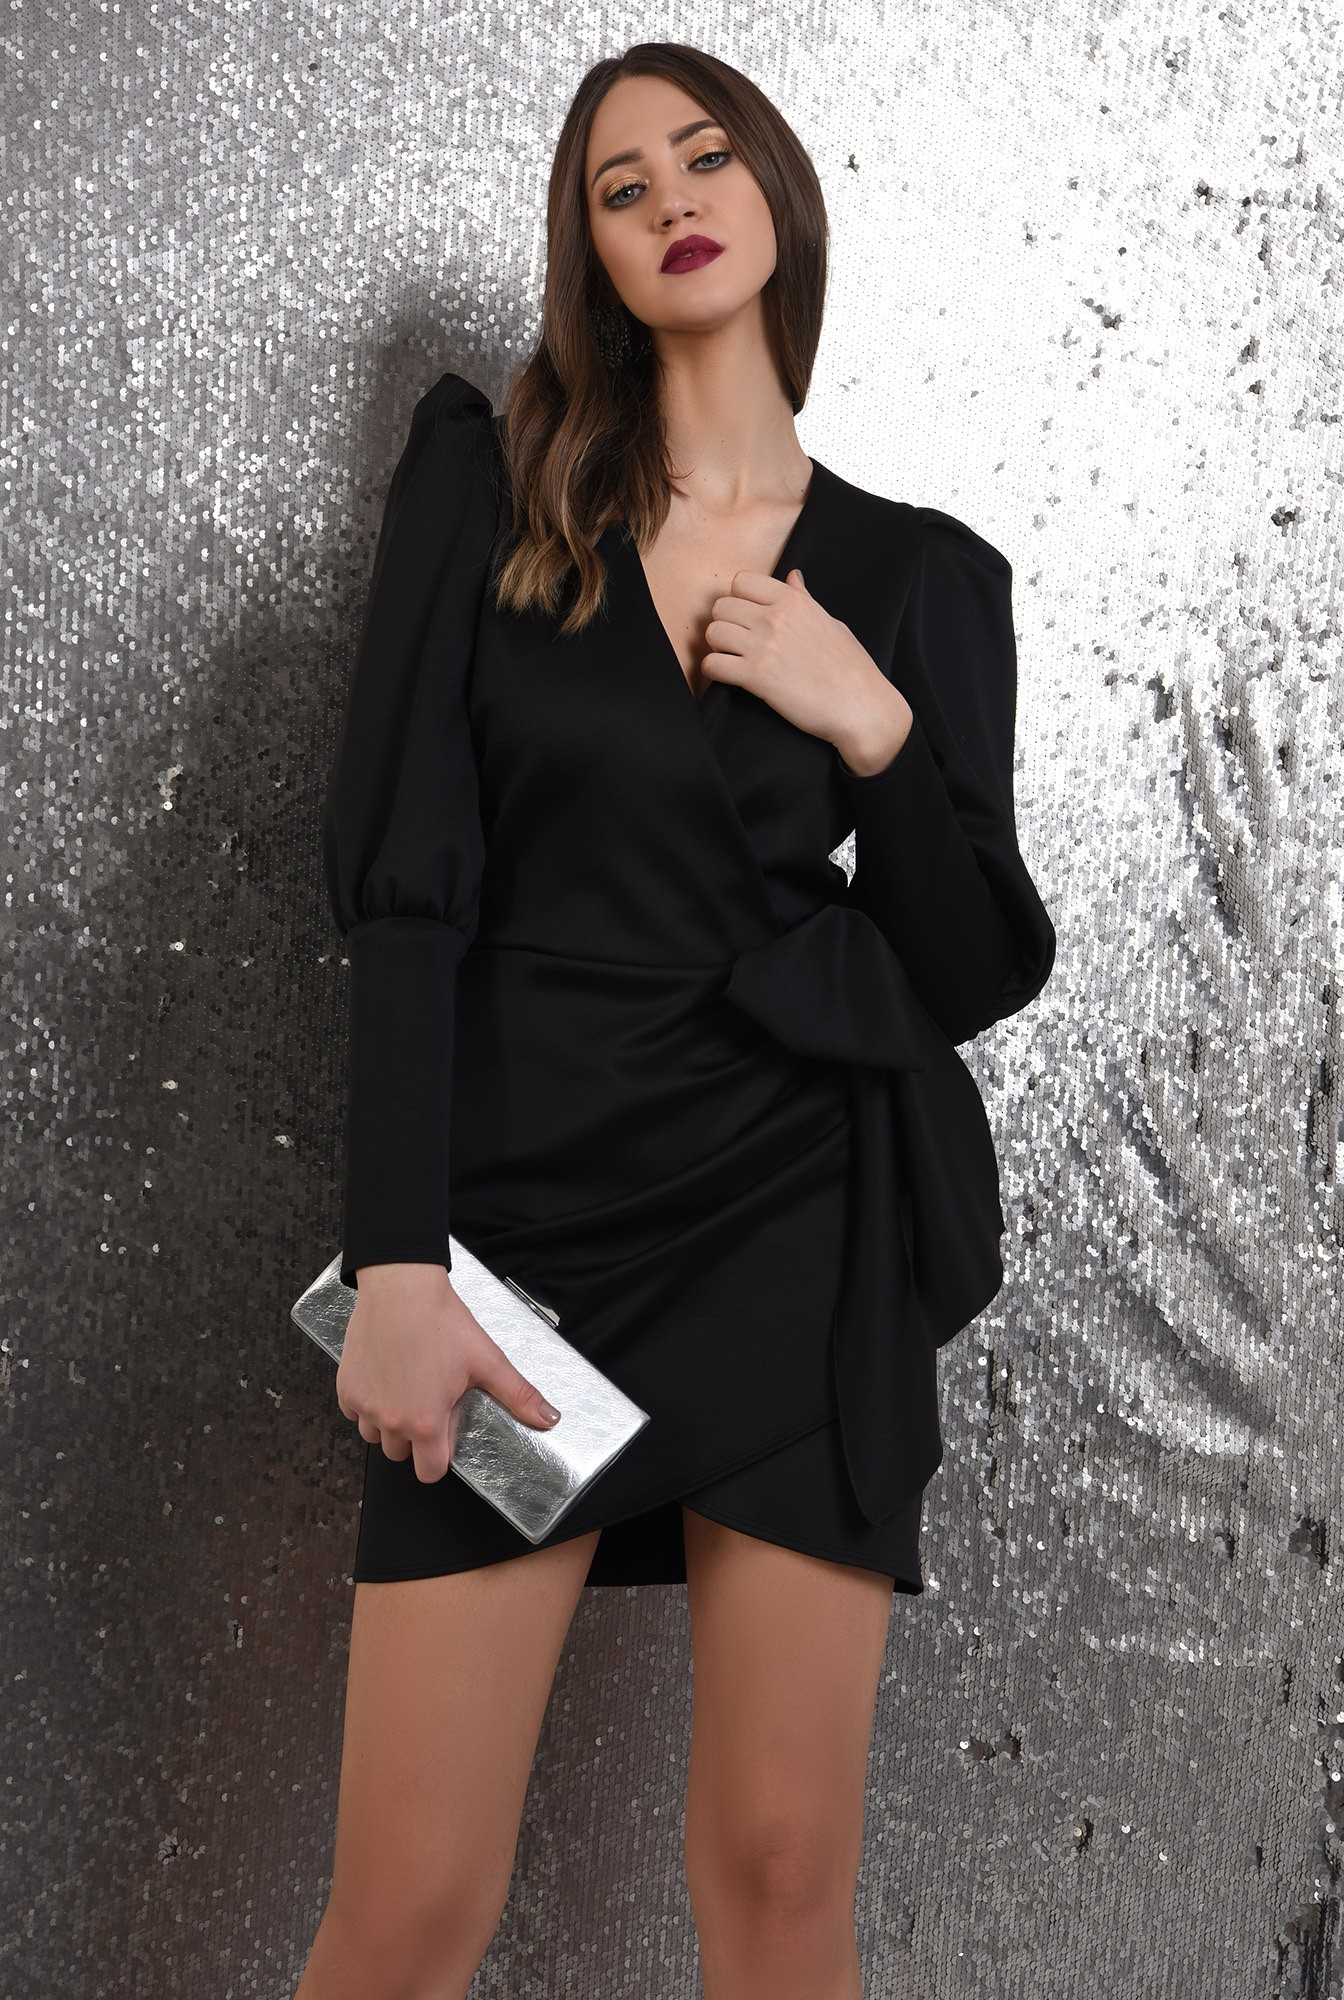 0 - rochie neagra, petrecuta, cu funda, maneci muton, Poema, rochie de seara